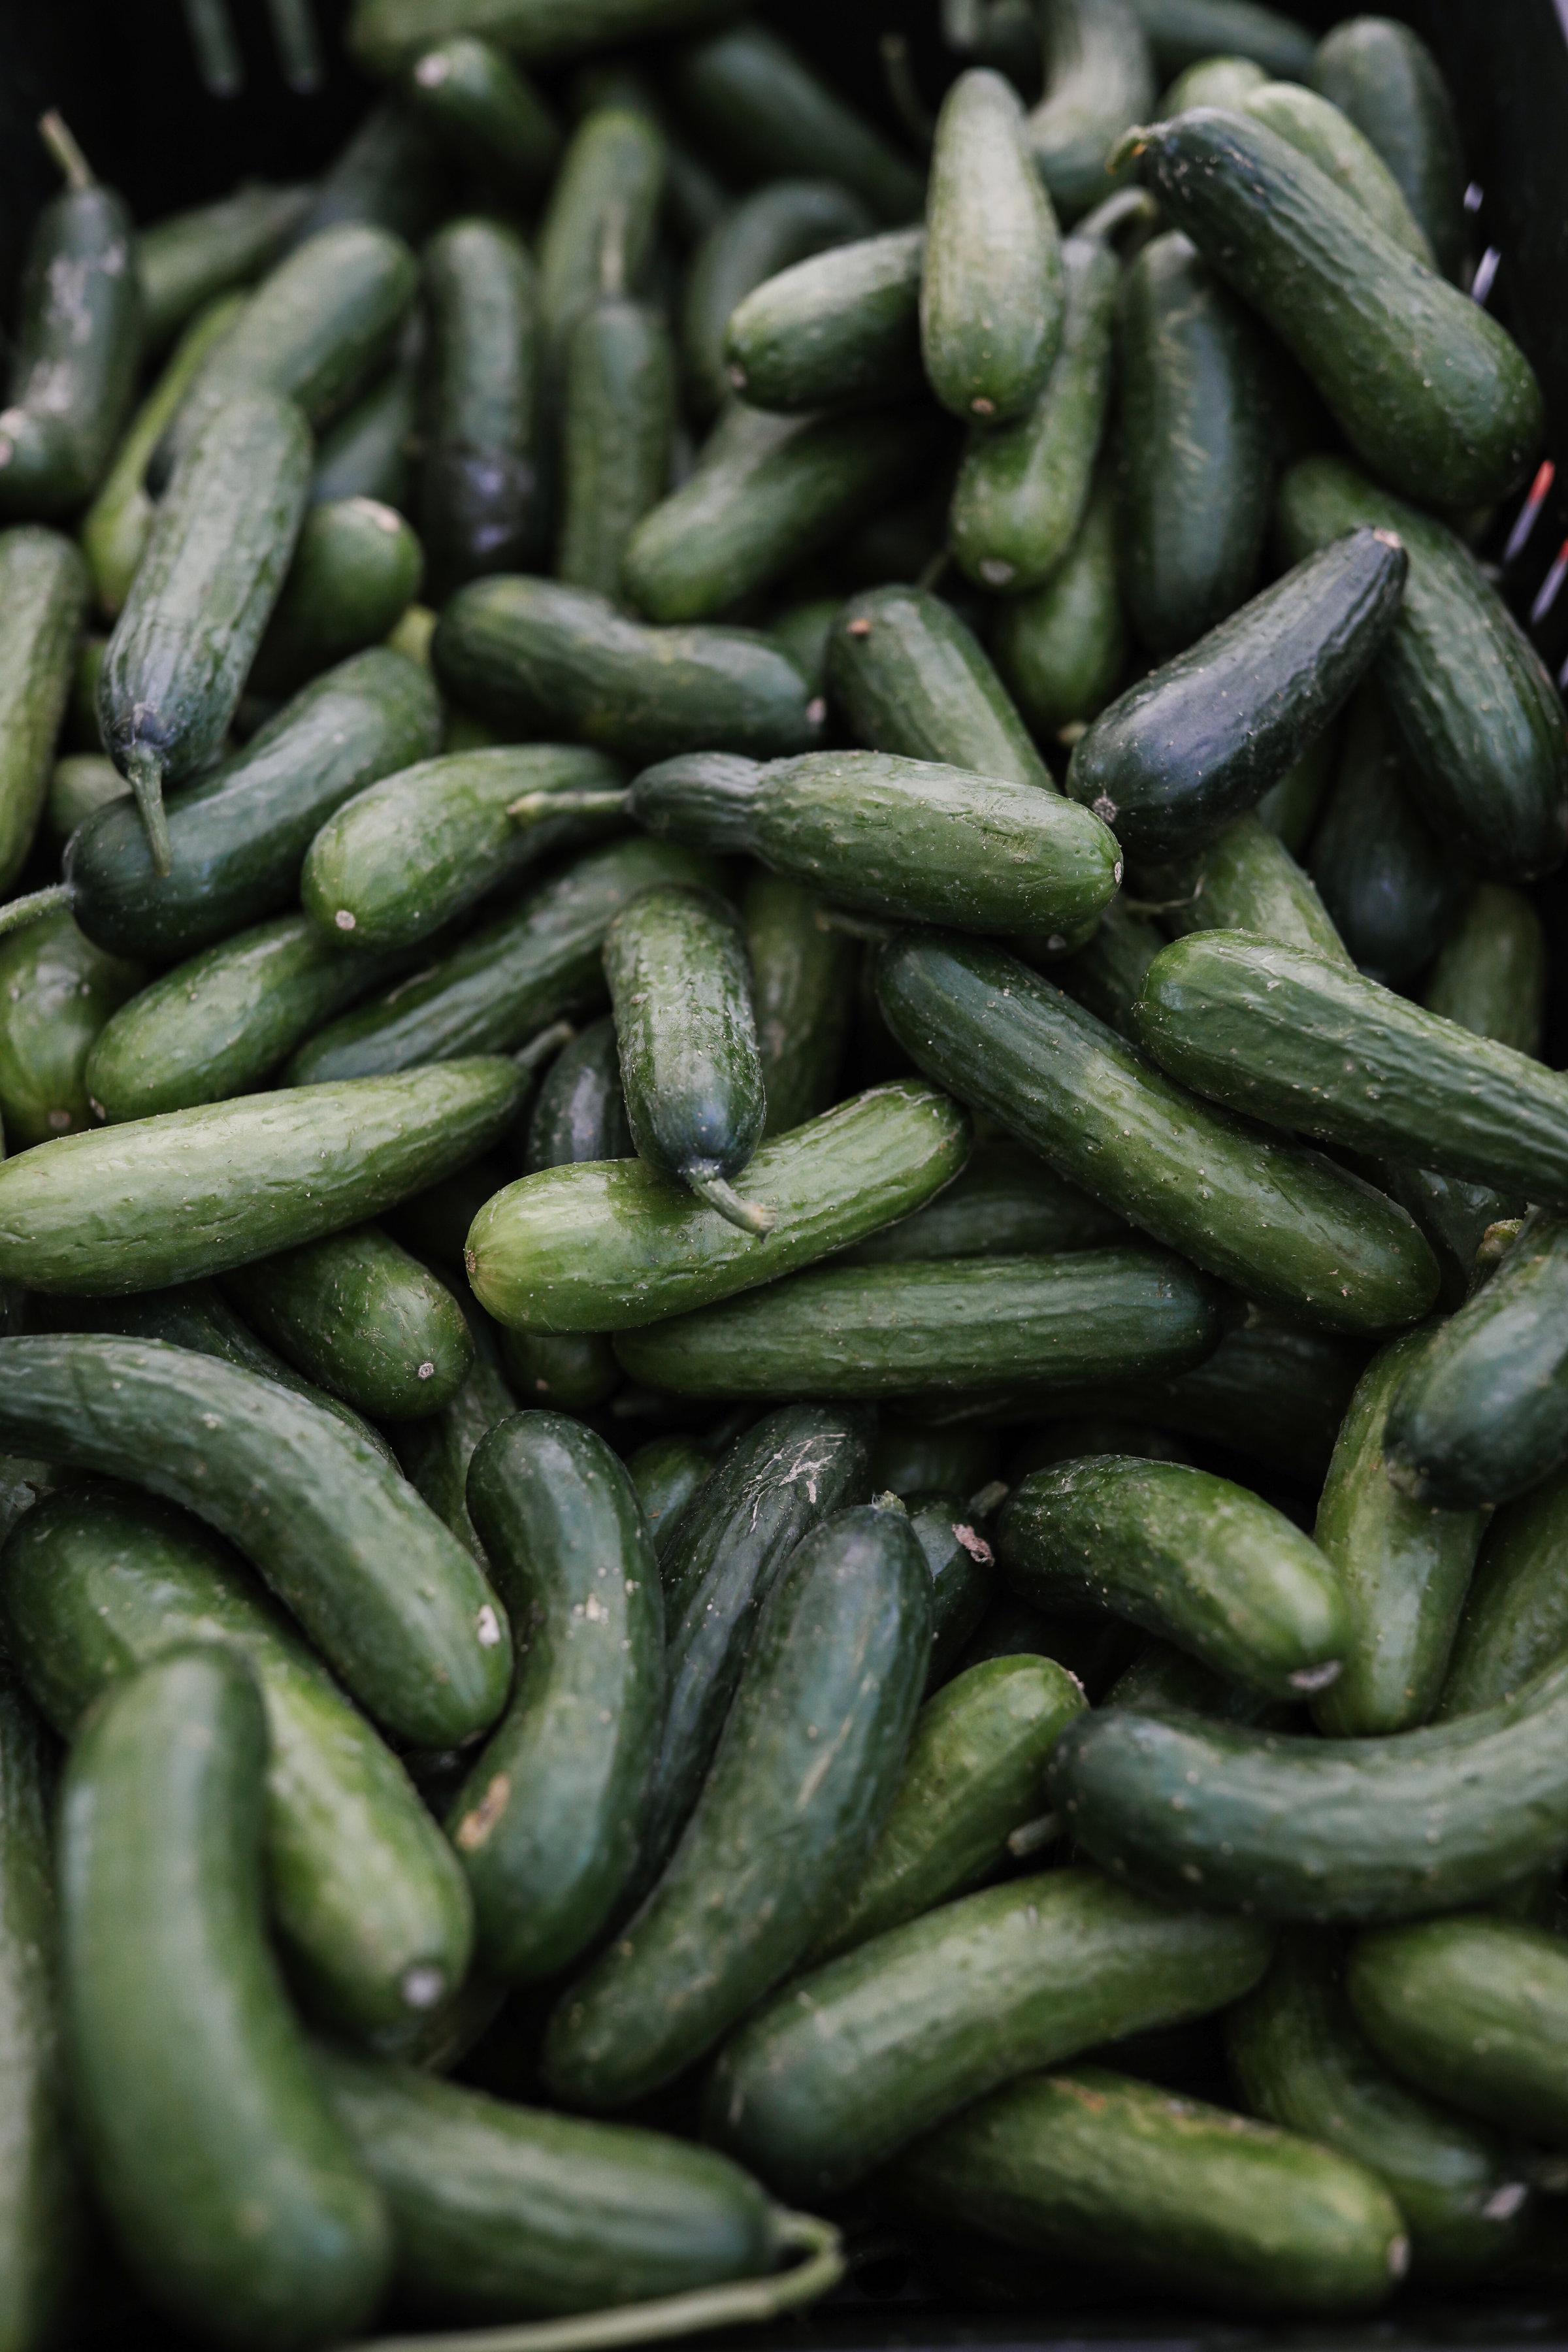 Zero waste at the farmers' market | Litterless